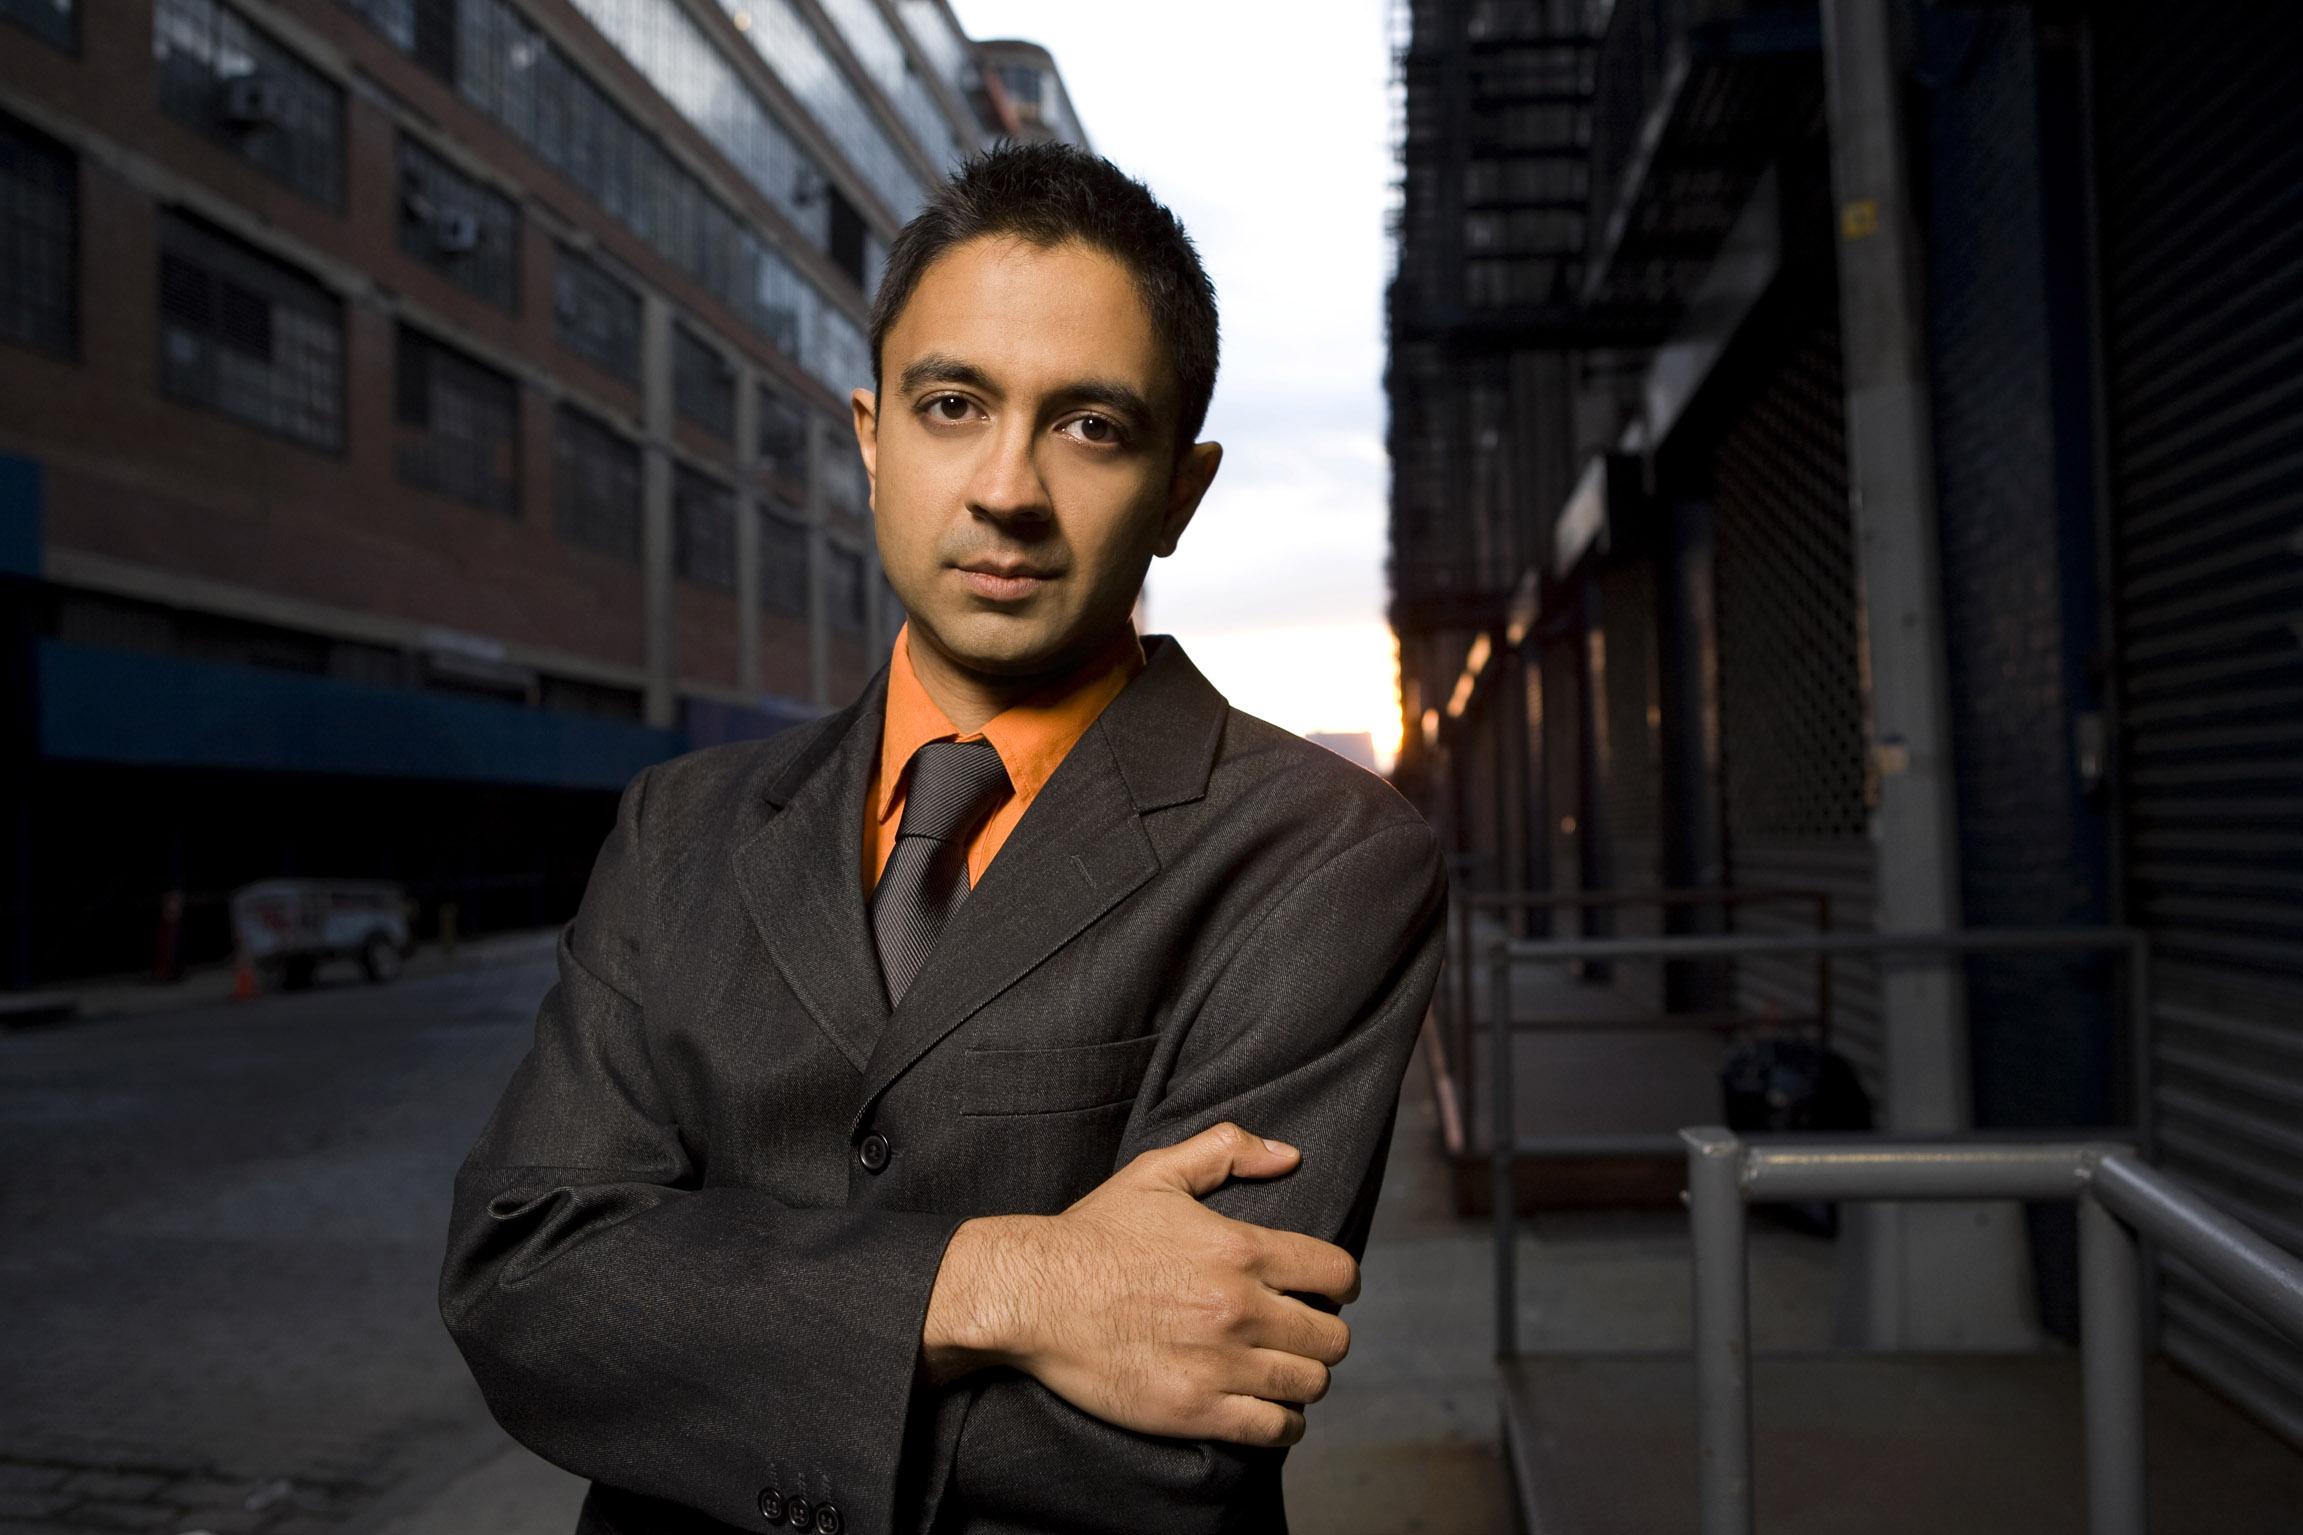 http://argentjazz.com.ar/wp-content/uploads/2012/11/Vijay-Iyer1.jpg